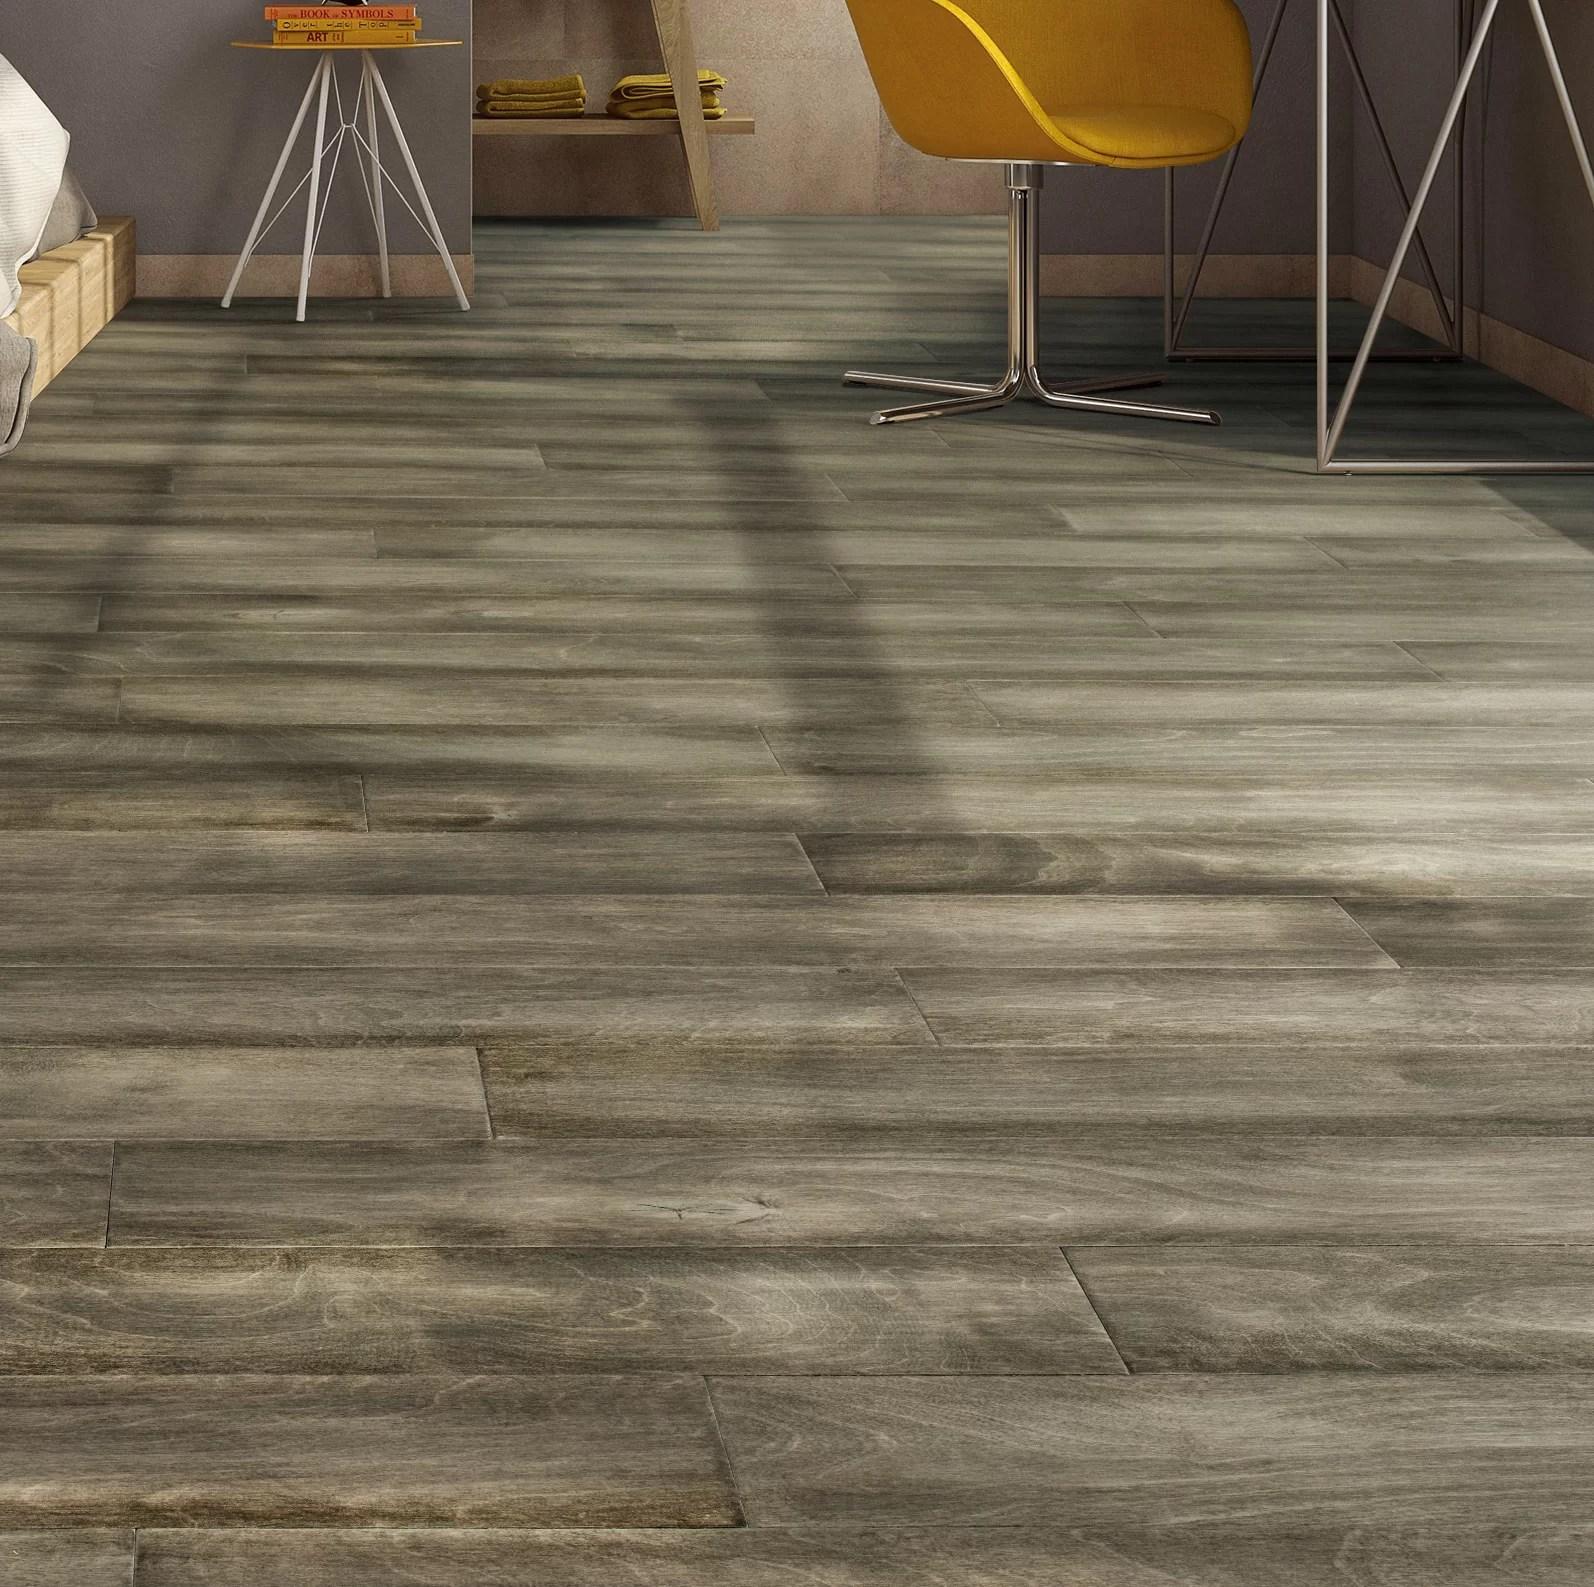 Micro Bevel Flooring